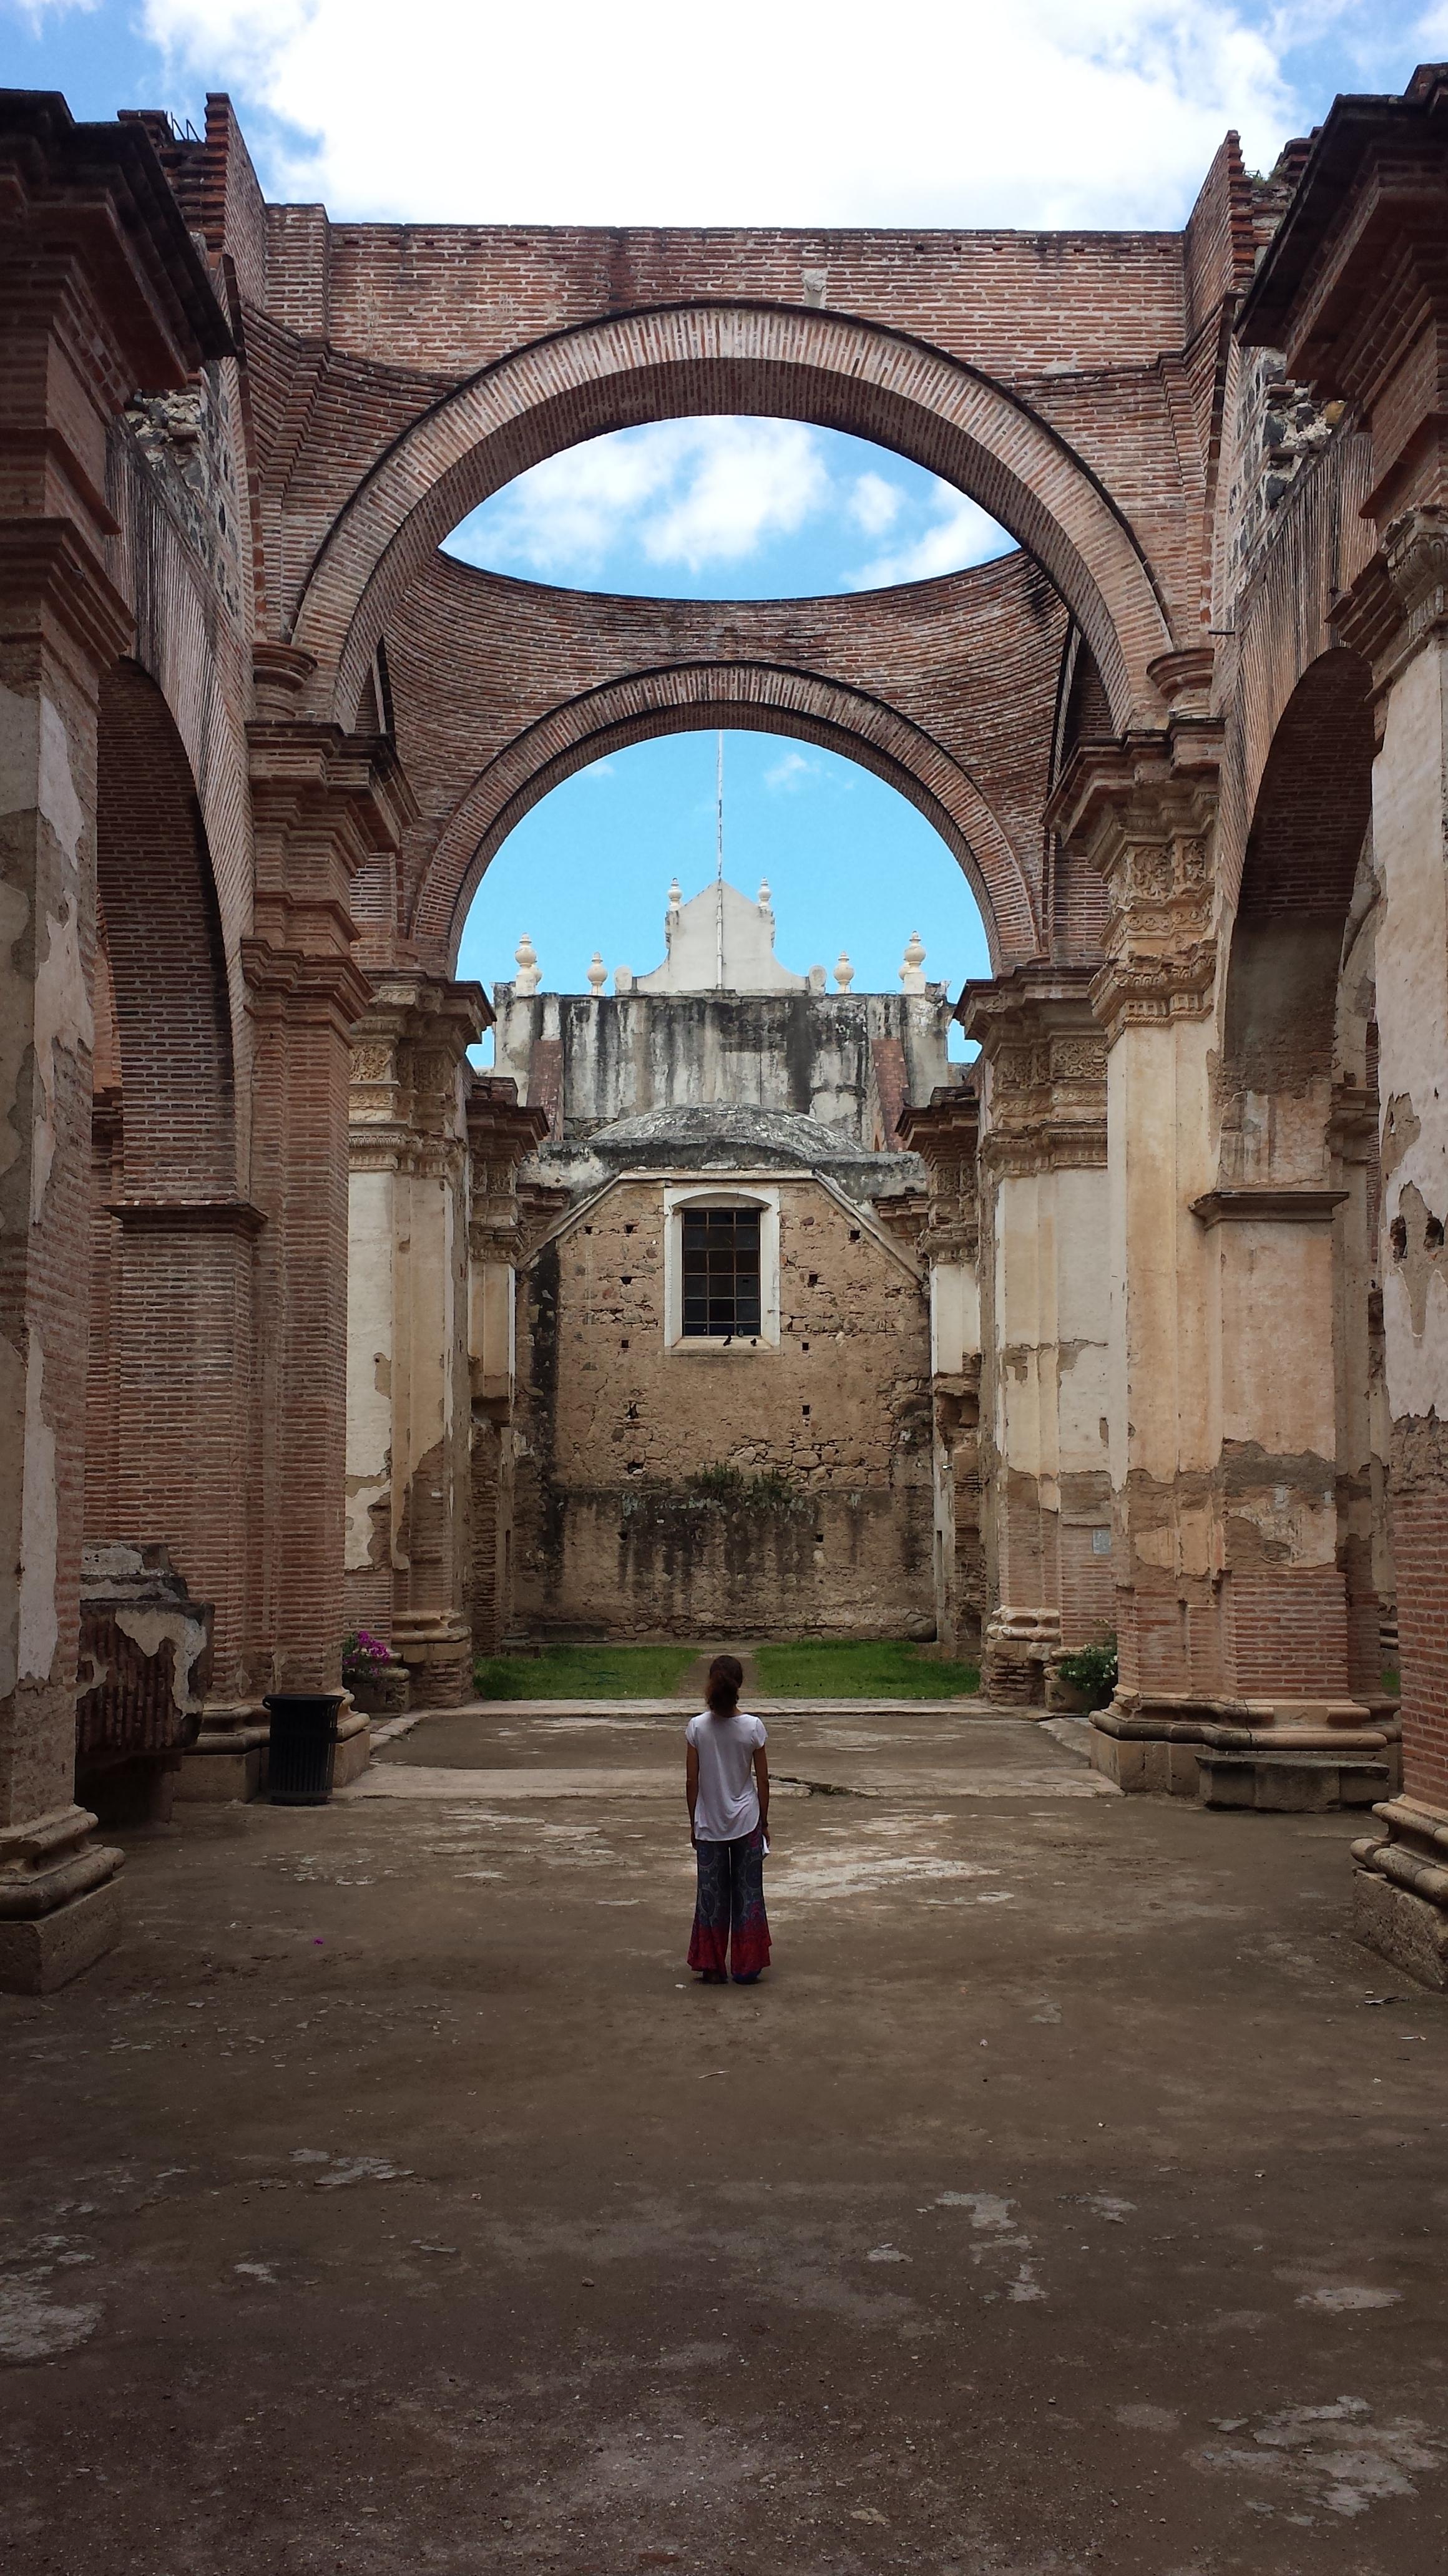 guatemalteca incontri doganali